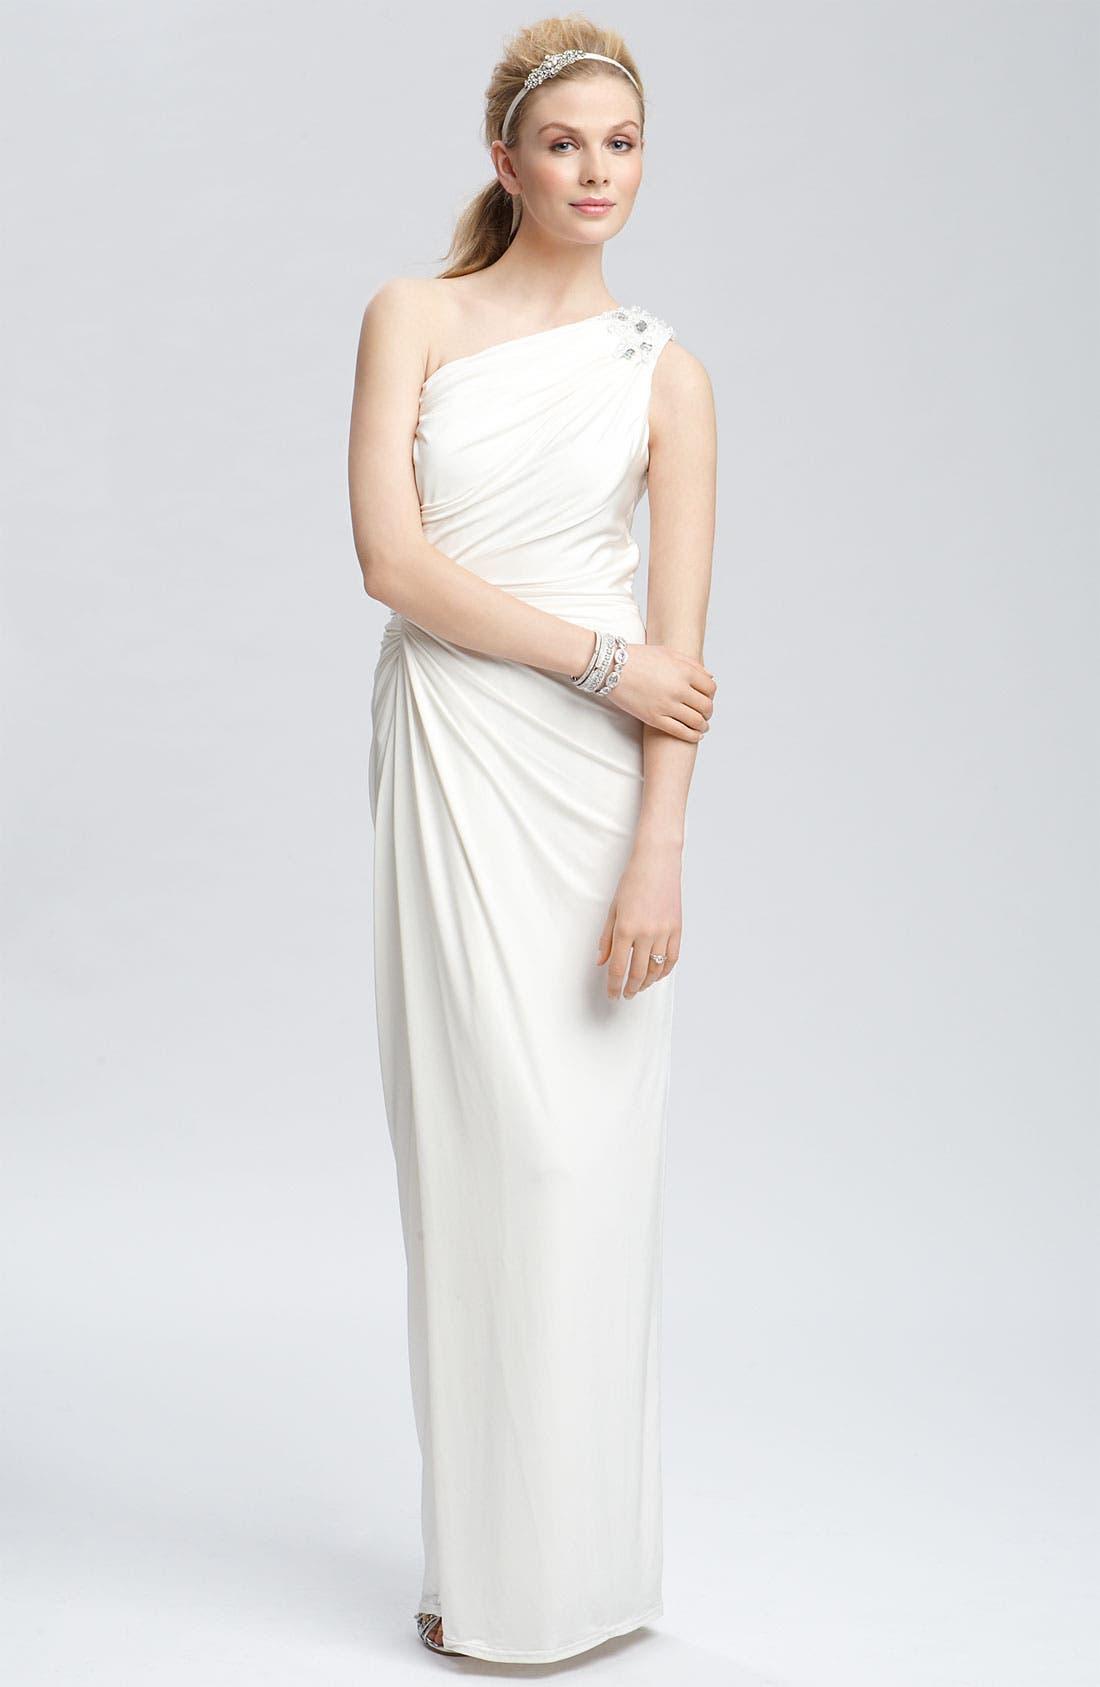 TADASHI SHOJI, Beaded Jersey One Shoulder Gown, Alternate thumbnail 5, color, 900